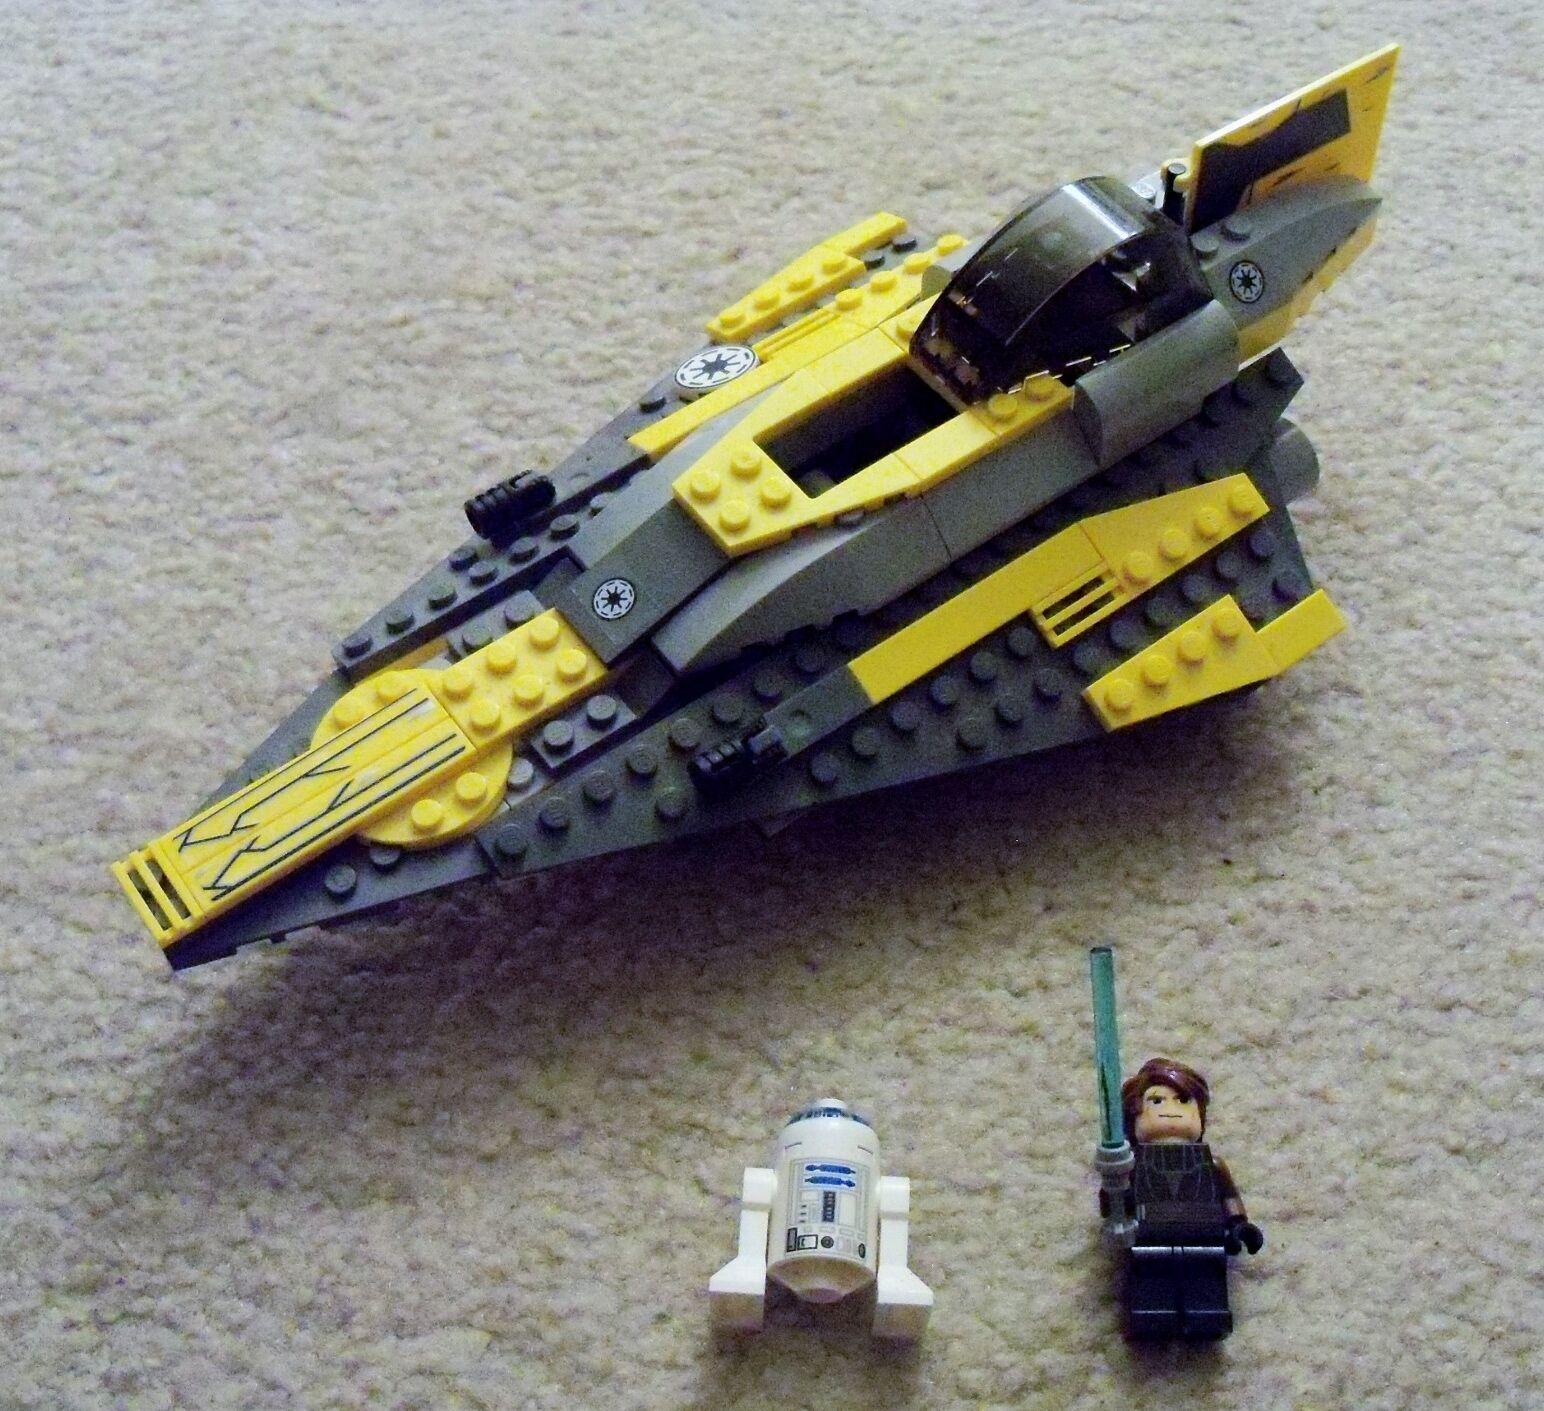 LEGO Star Wars - Rare Anakin's Jedi Starfighter 7669 - Complete